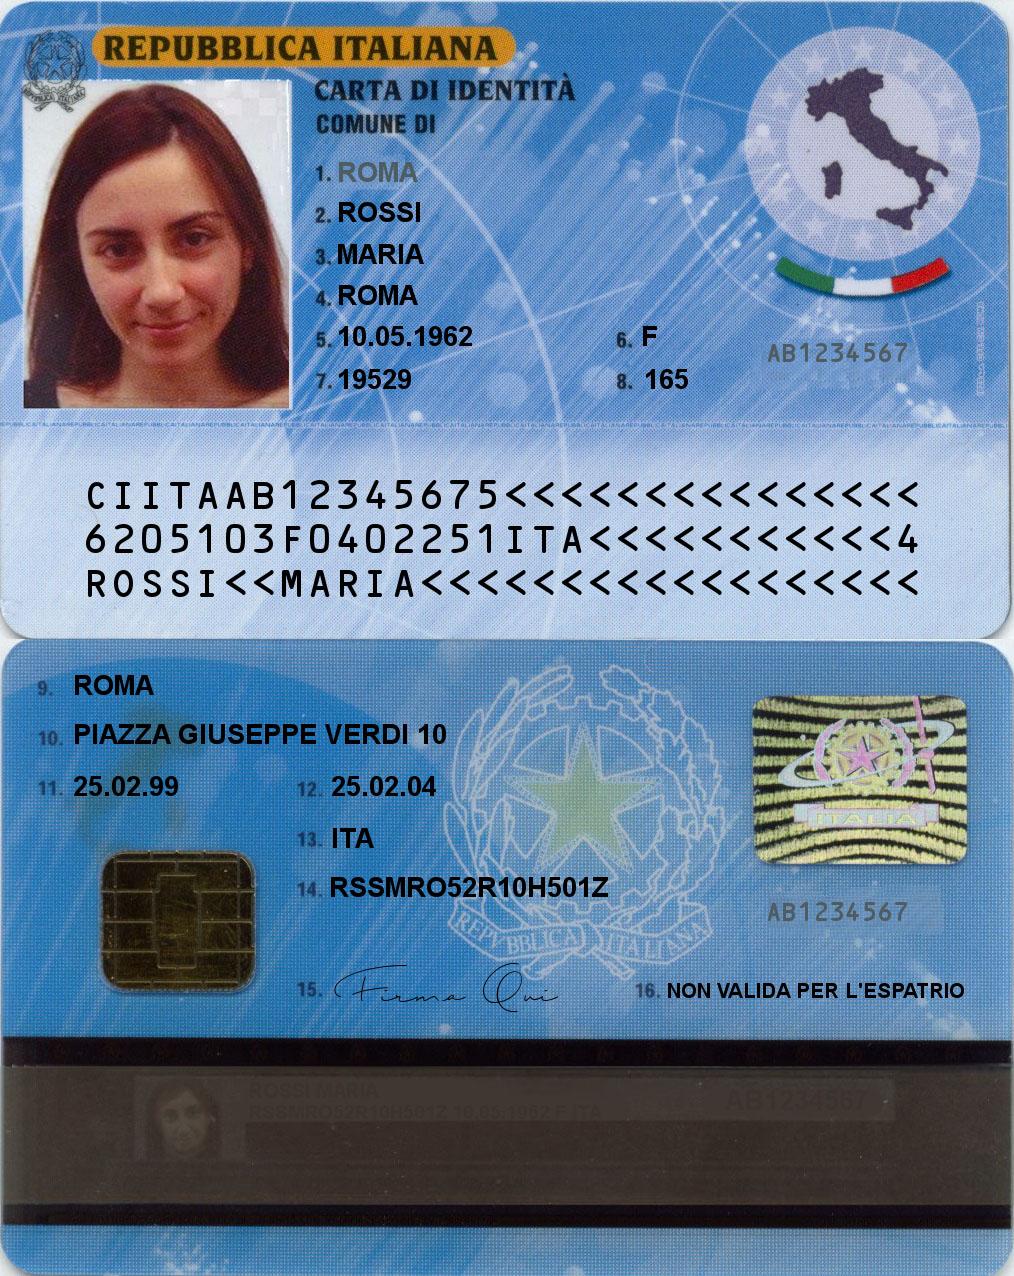 Carta d\'identità elettronica italiana - Wikipedia